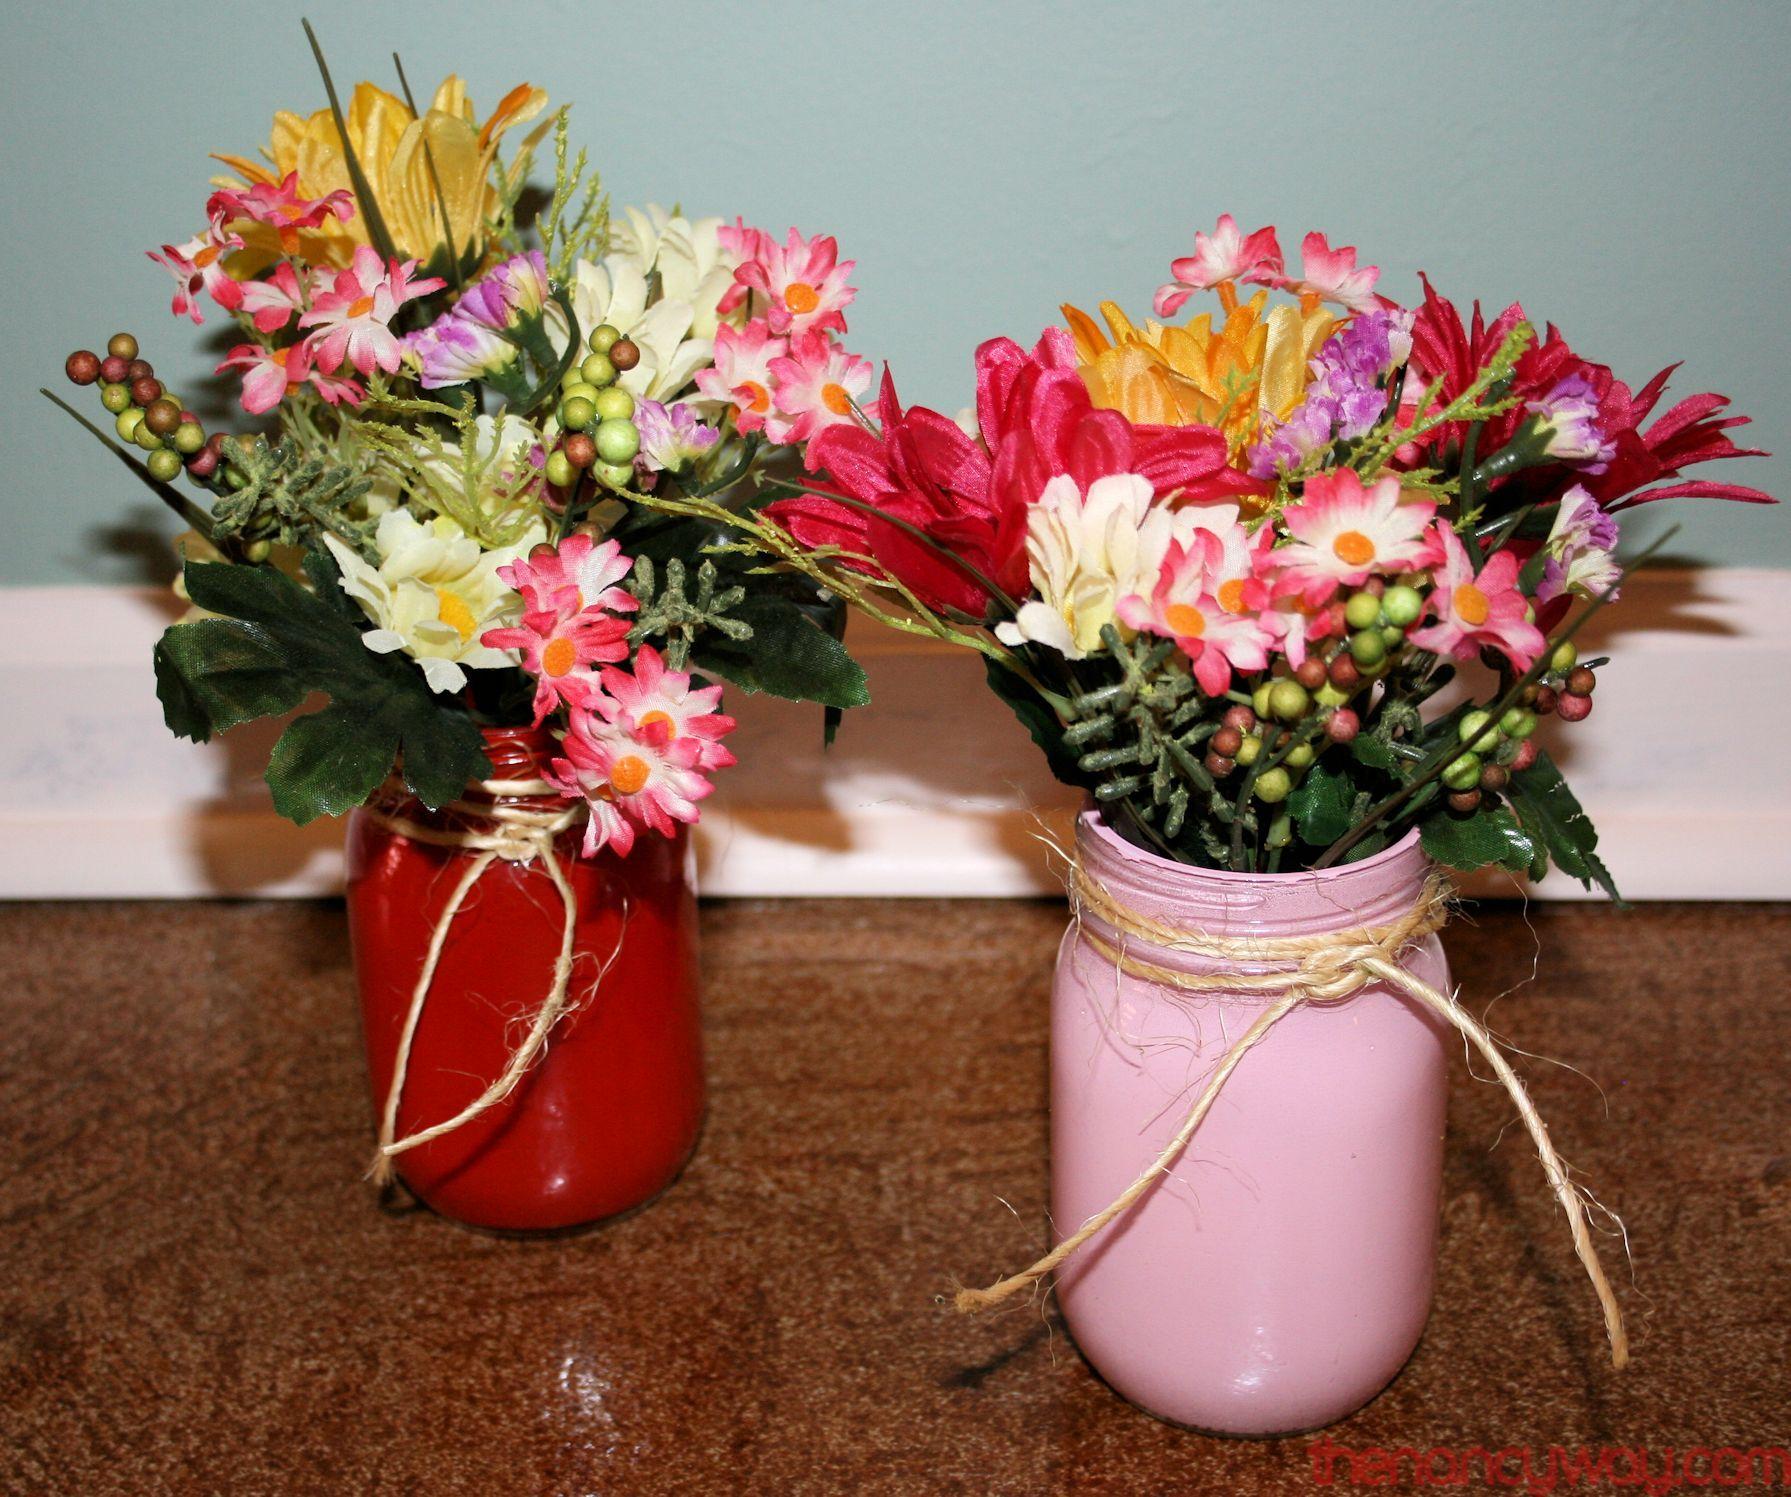 Tabletop adult birthday flower centerpiece ideas google